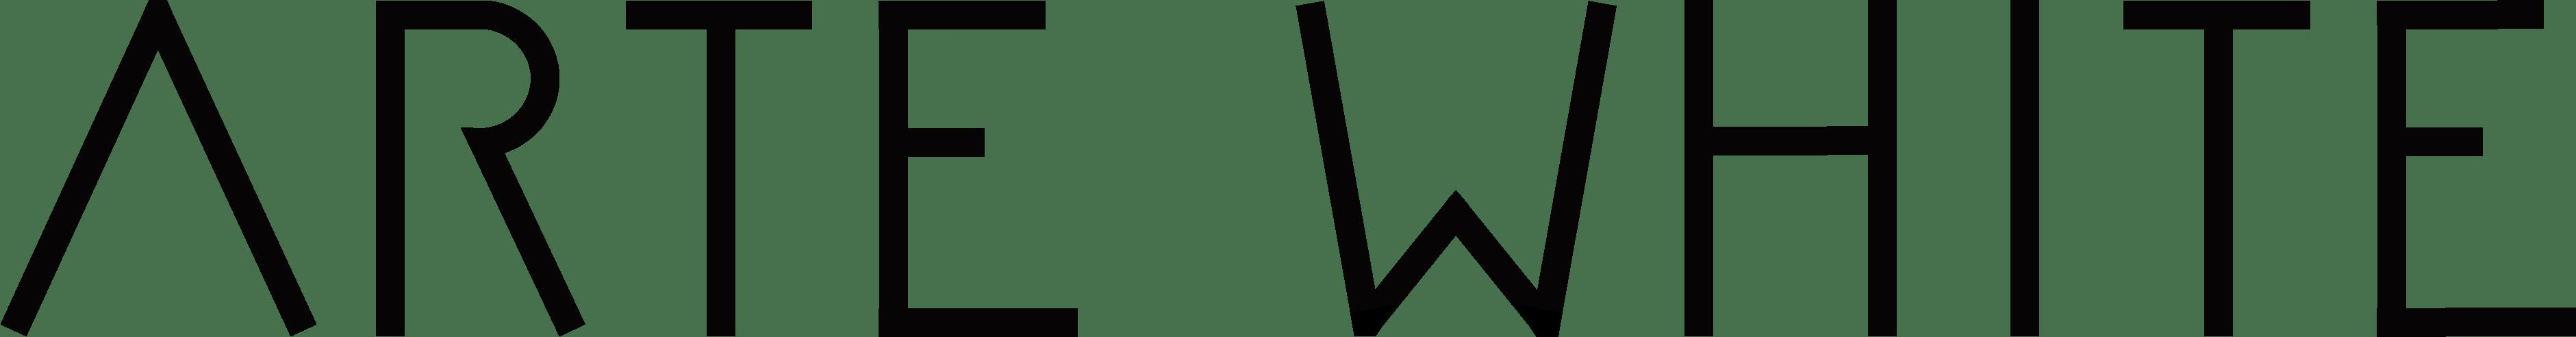 home header arte white logo 20210322